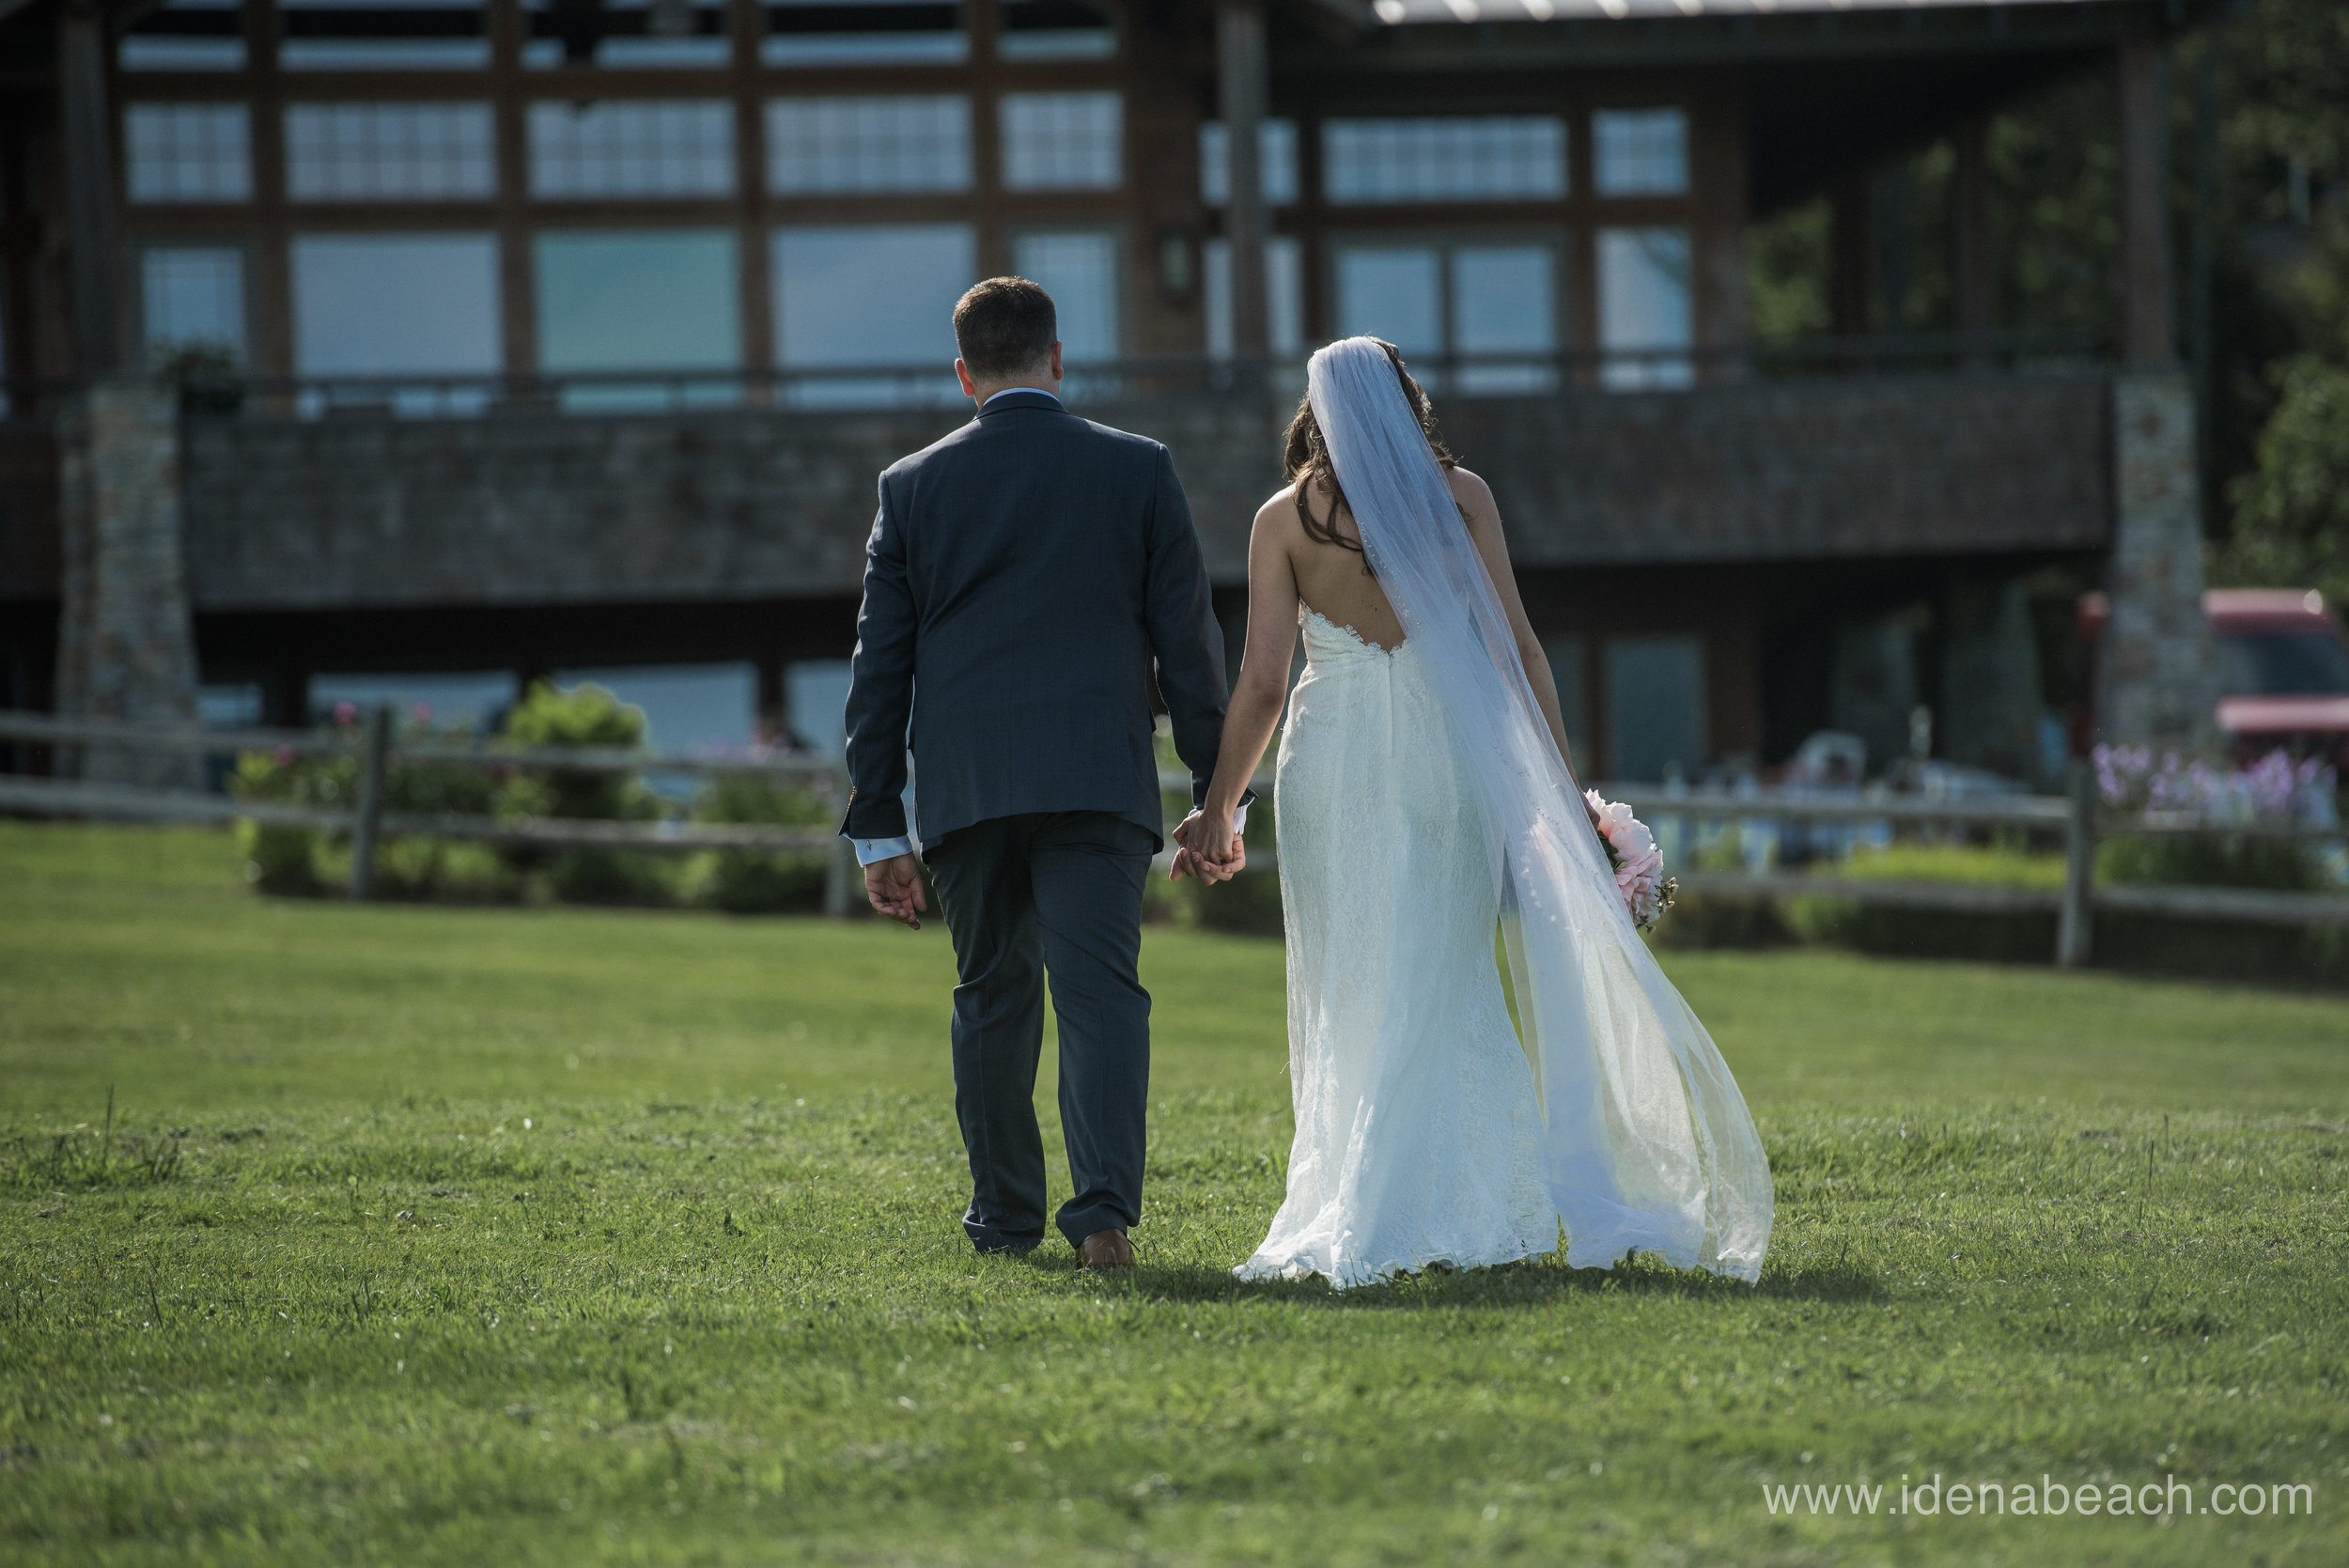 Mountain-Top-Inn-Vermont-Wedding-Photographer-71.jpg